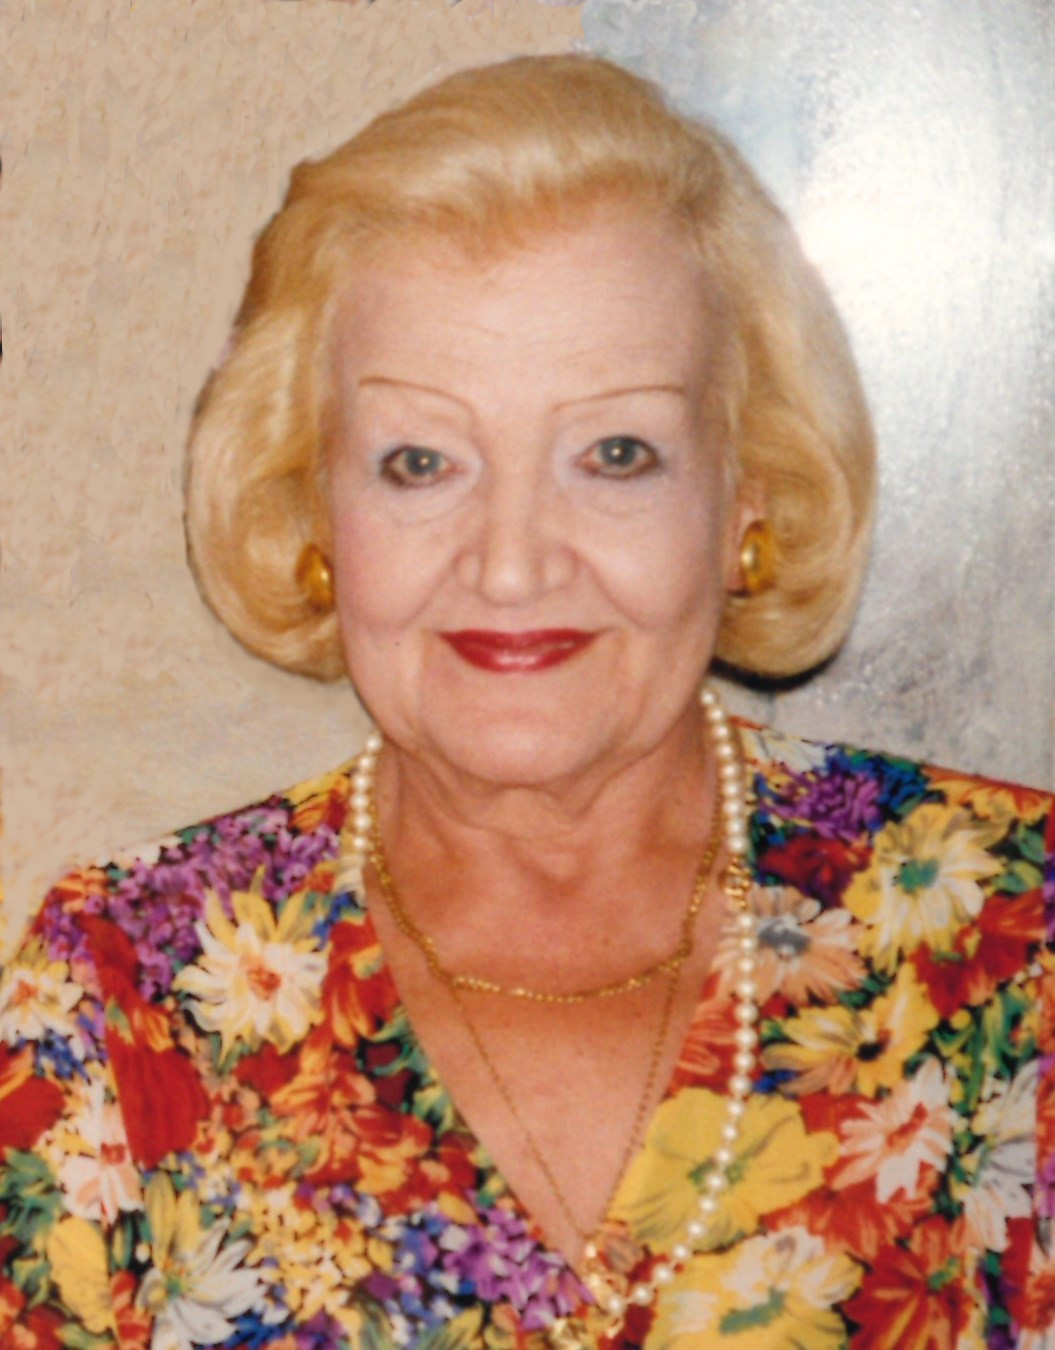 Gina Maria Nobile